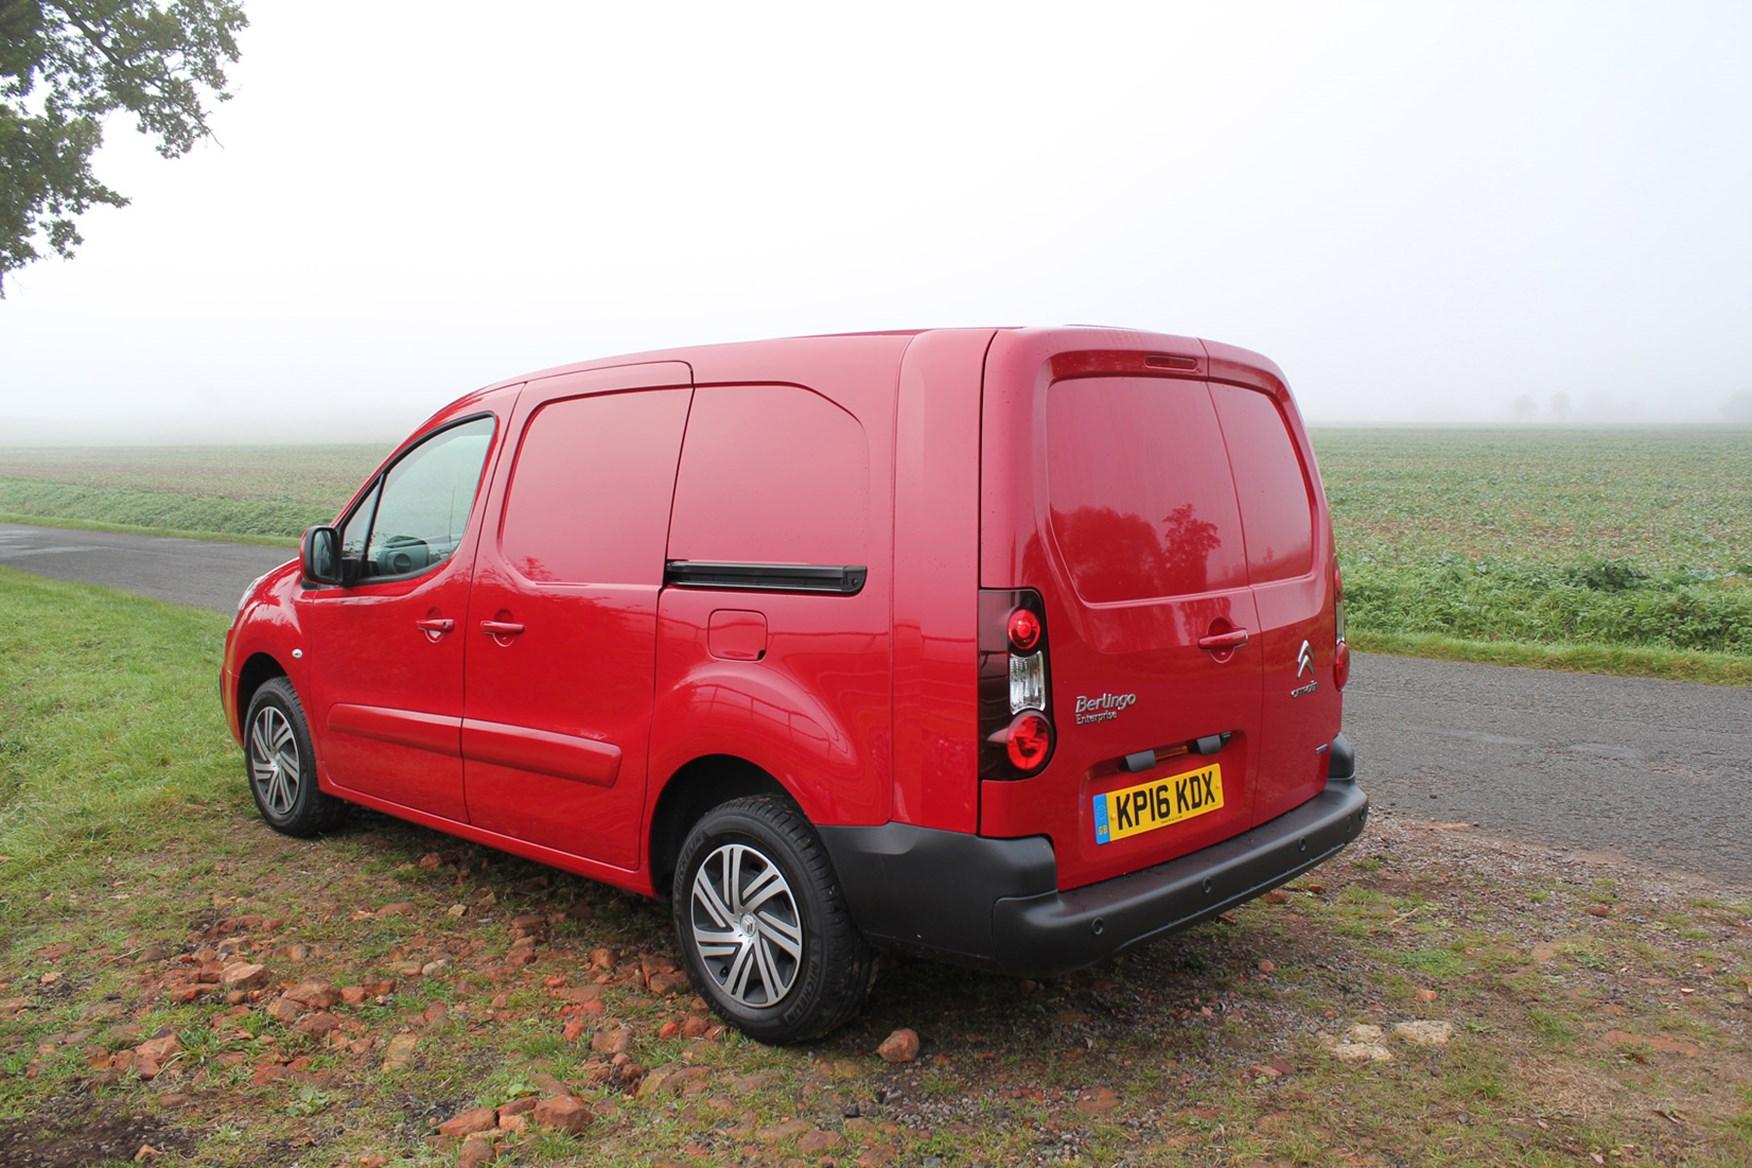 Citroen Berlingo full review on Parkers Vans - rear